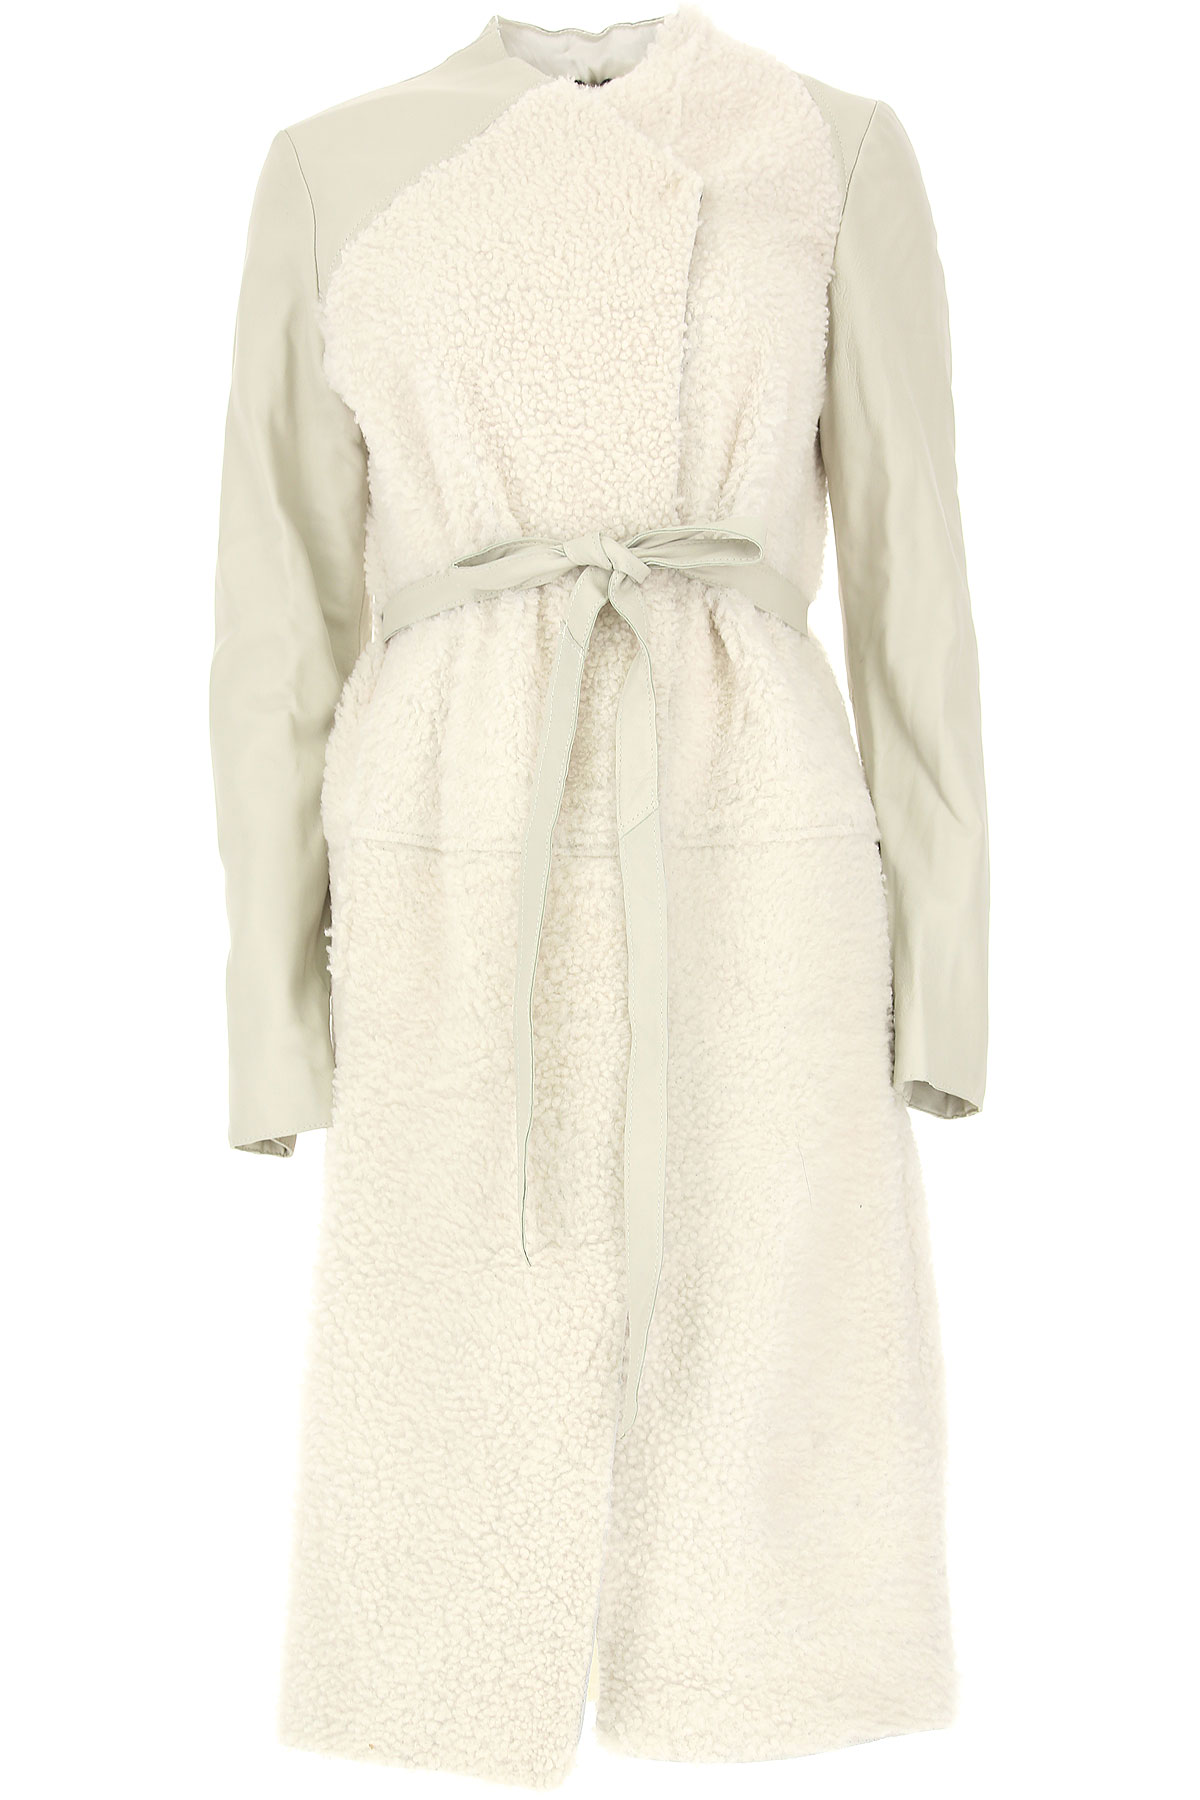 Image of WLG by Giorgio Brato Women\'s Coat, White, Virgin wool, 2017, 10 4 6 8